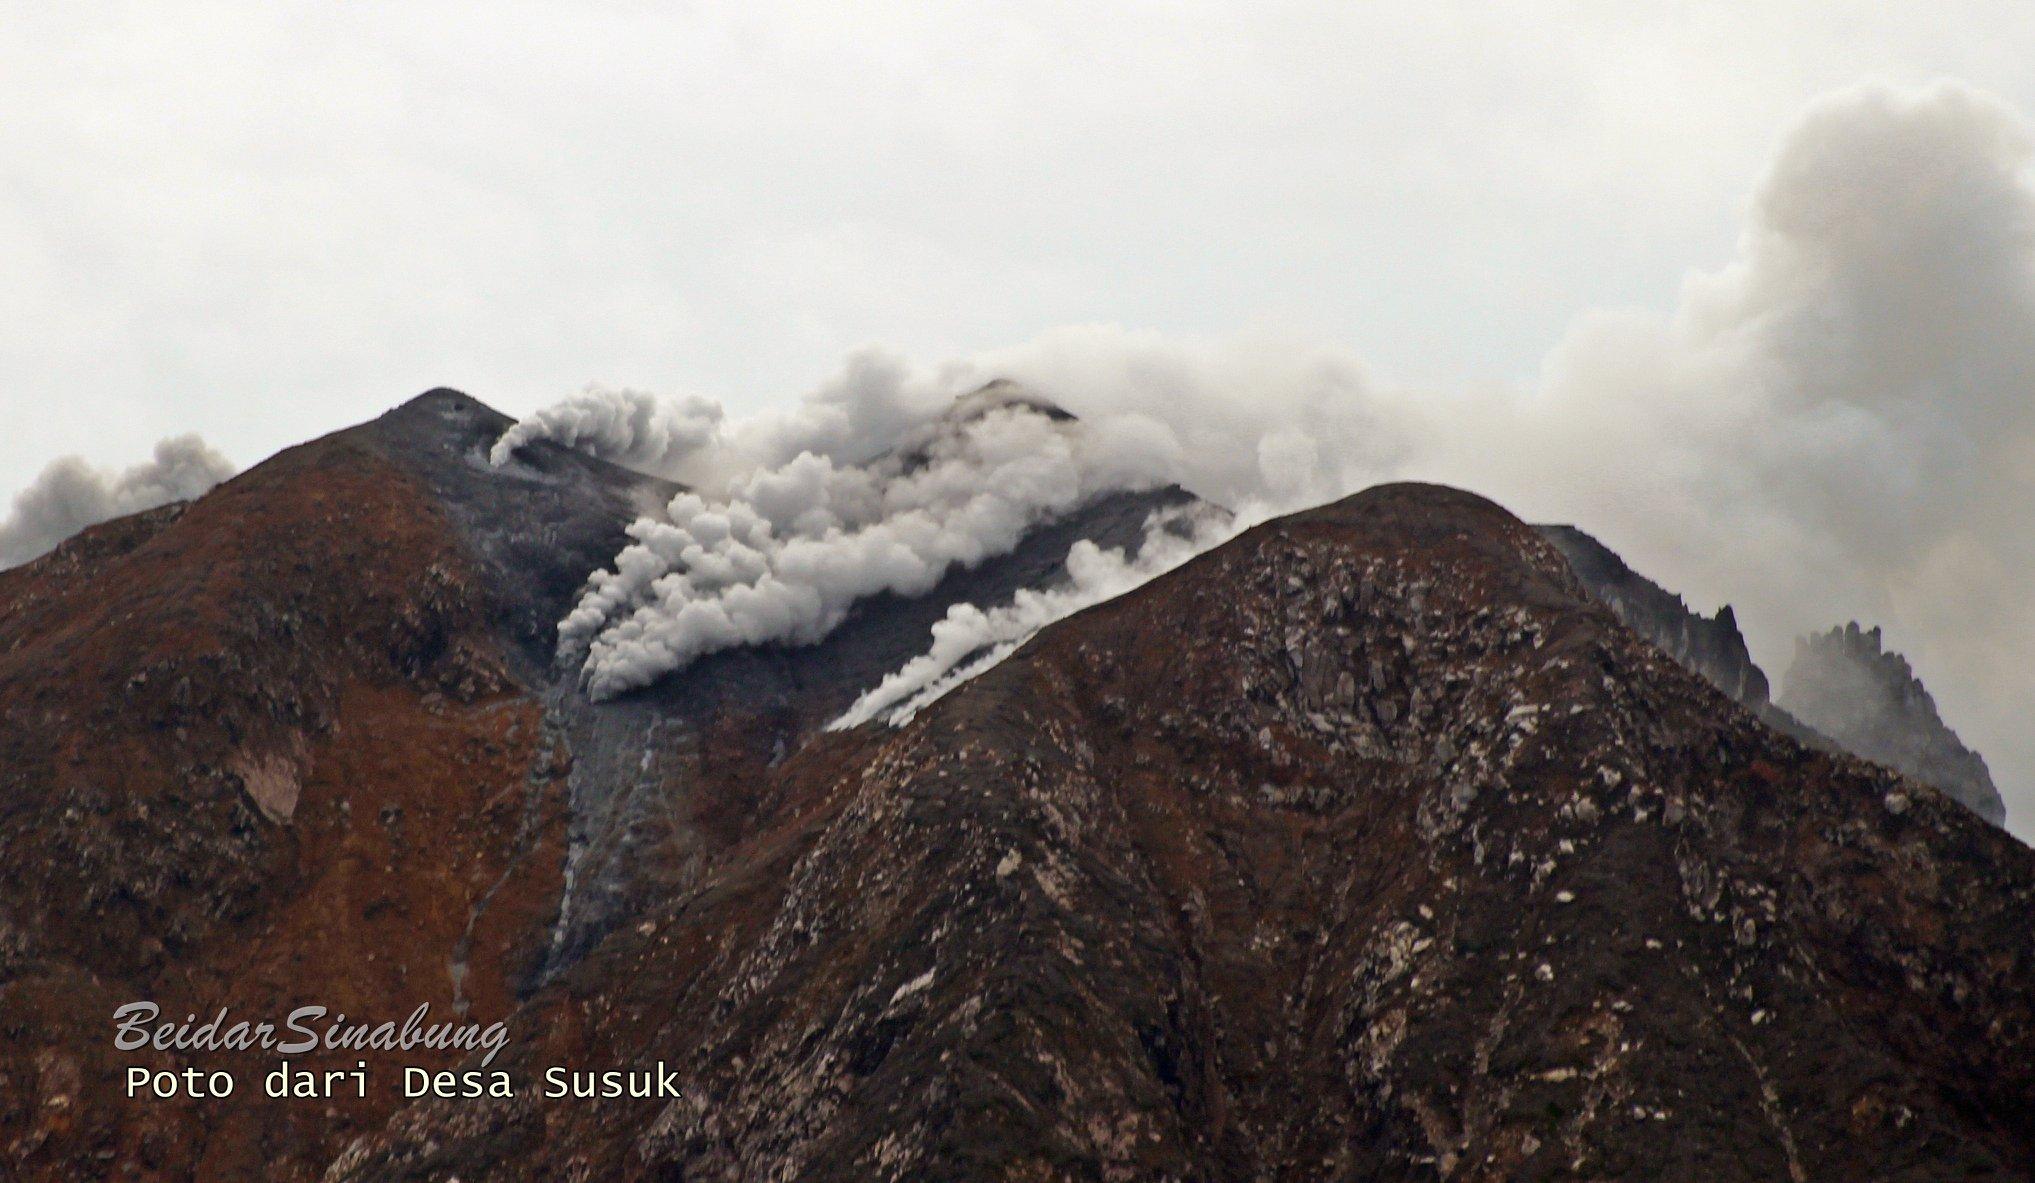 August 13, 2020. EN . Indonesia : Sinabung , Japan : Sakurajima , Ecuador : Sangay , Costa Rica : Turrialba / Poas / Rincon de la Vieja .